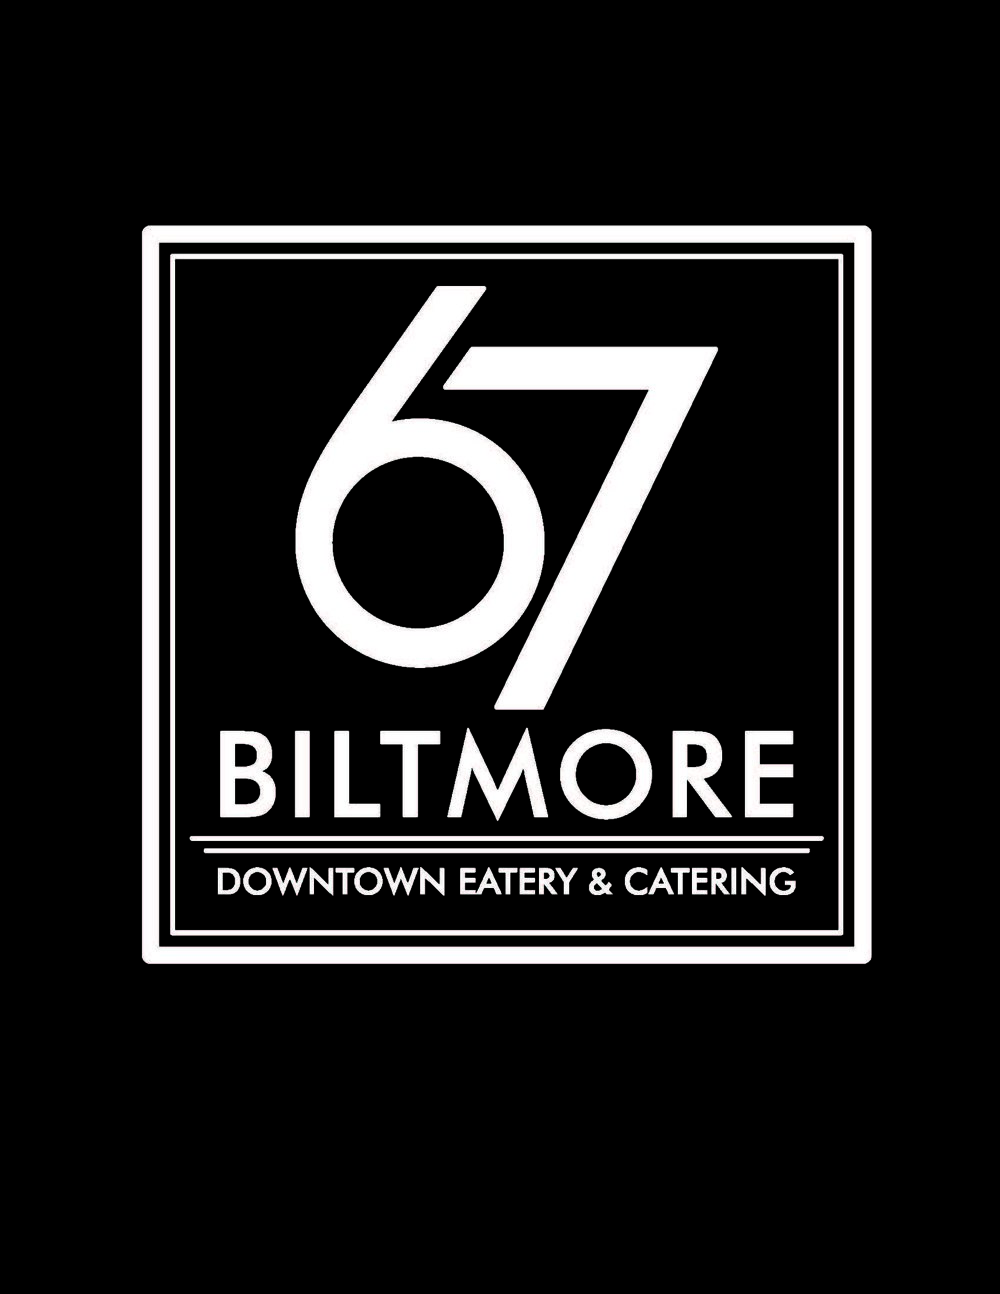 67Biltmore - inverse (1).jpg